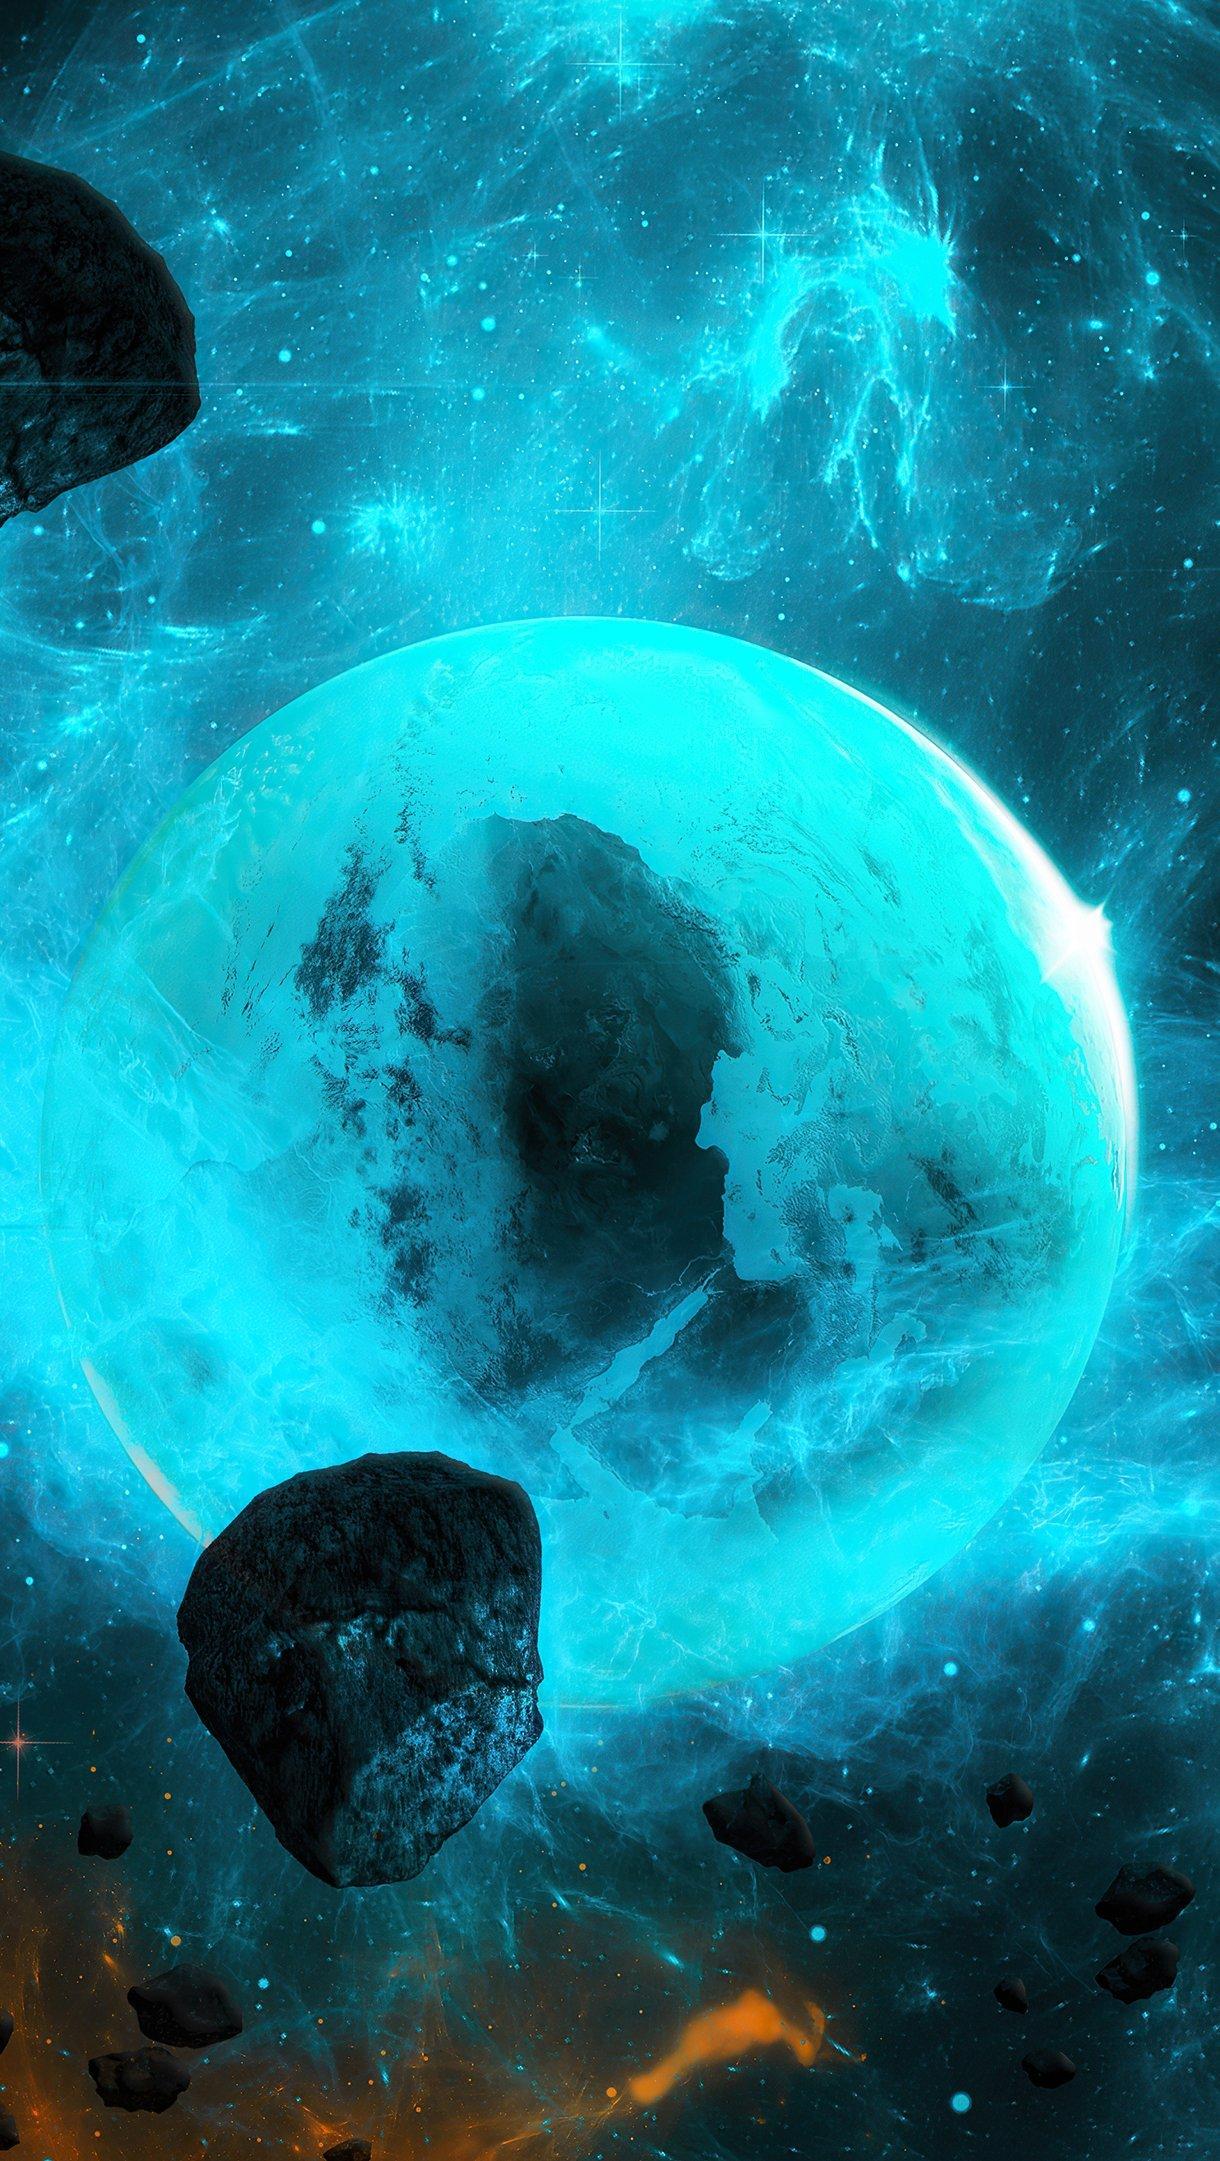 Wallpaper Planets Vertical